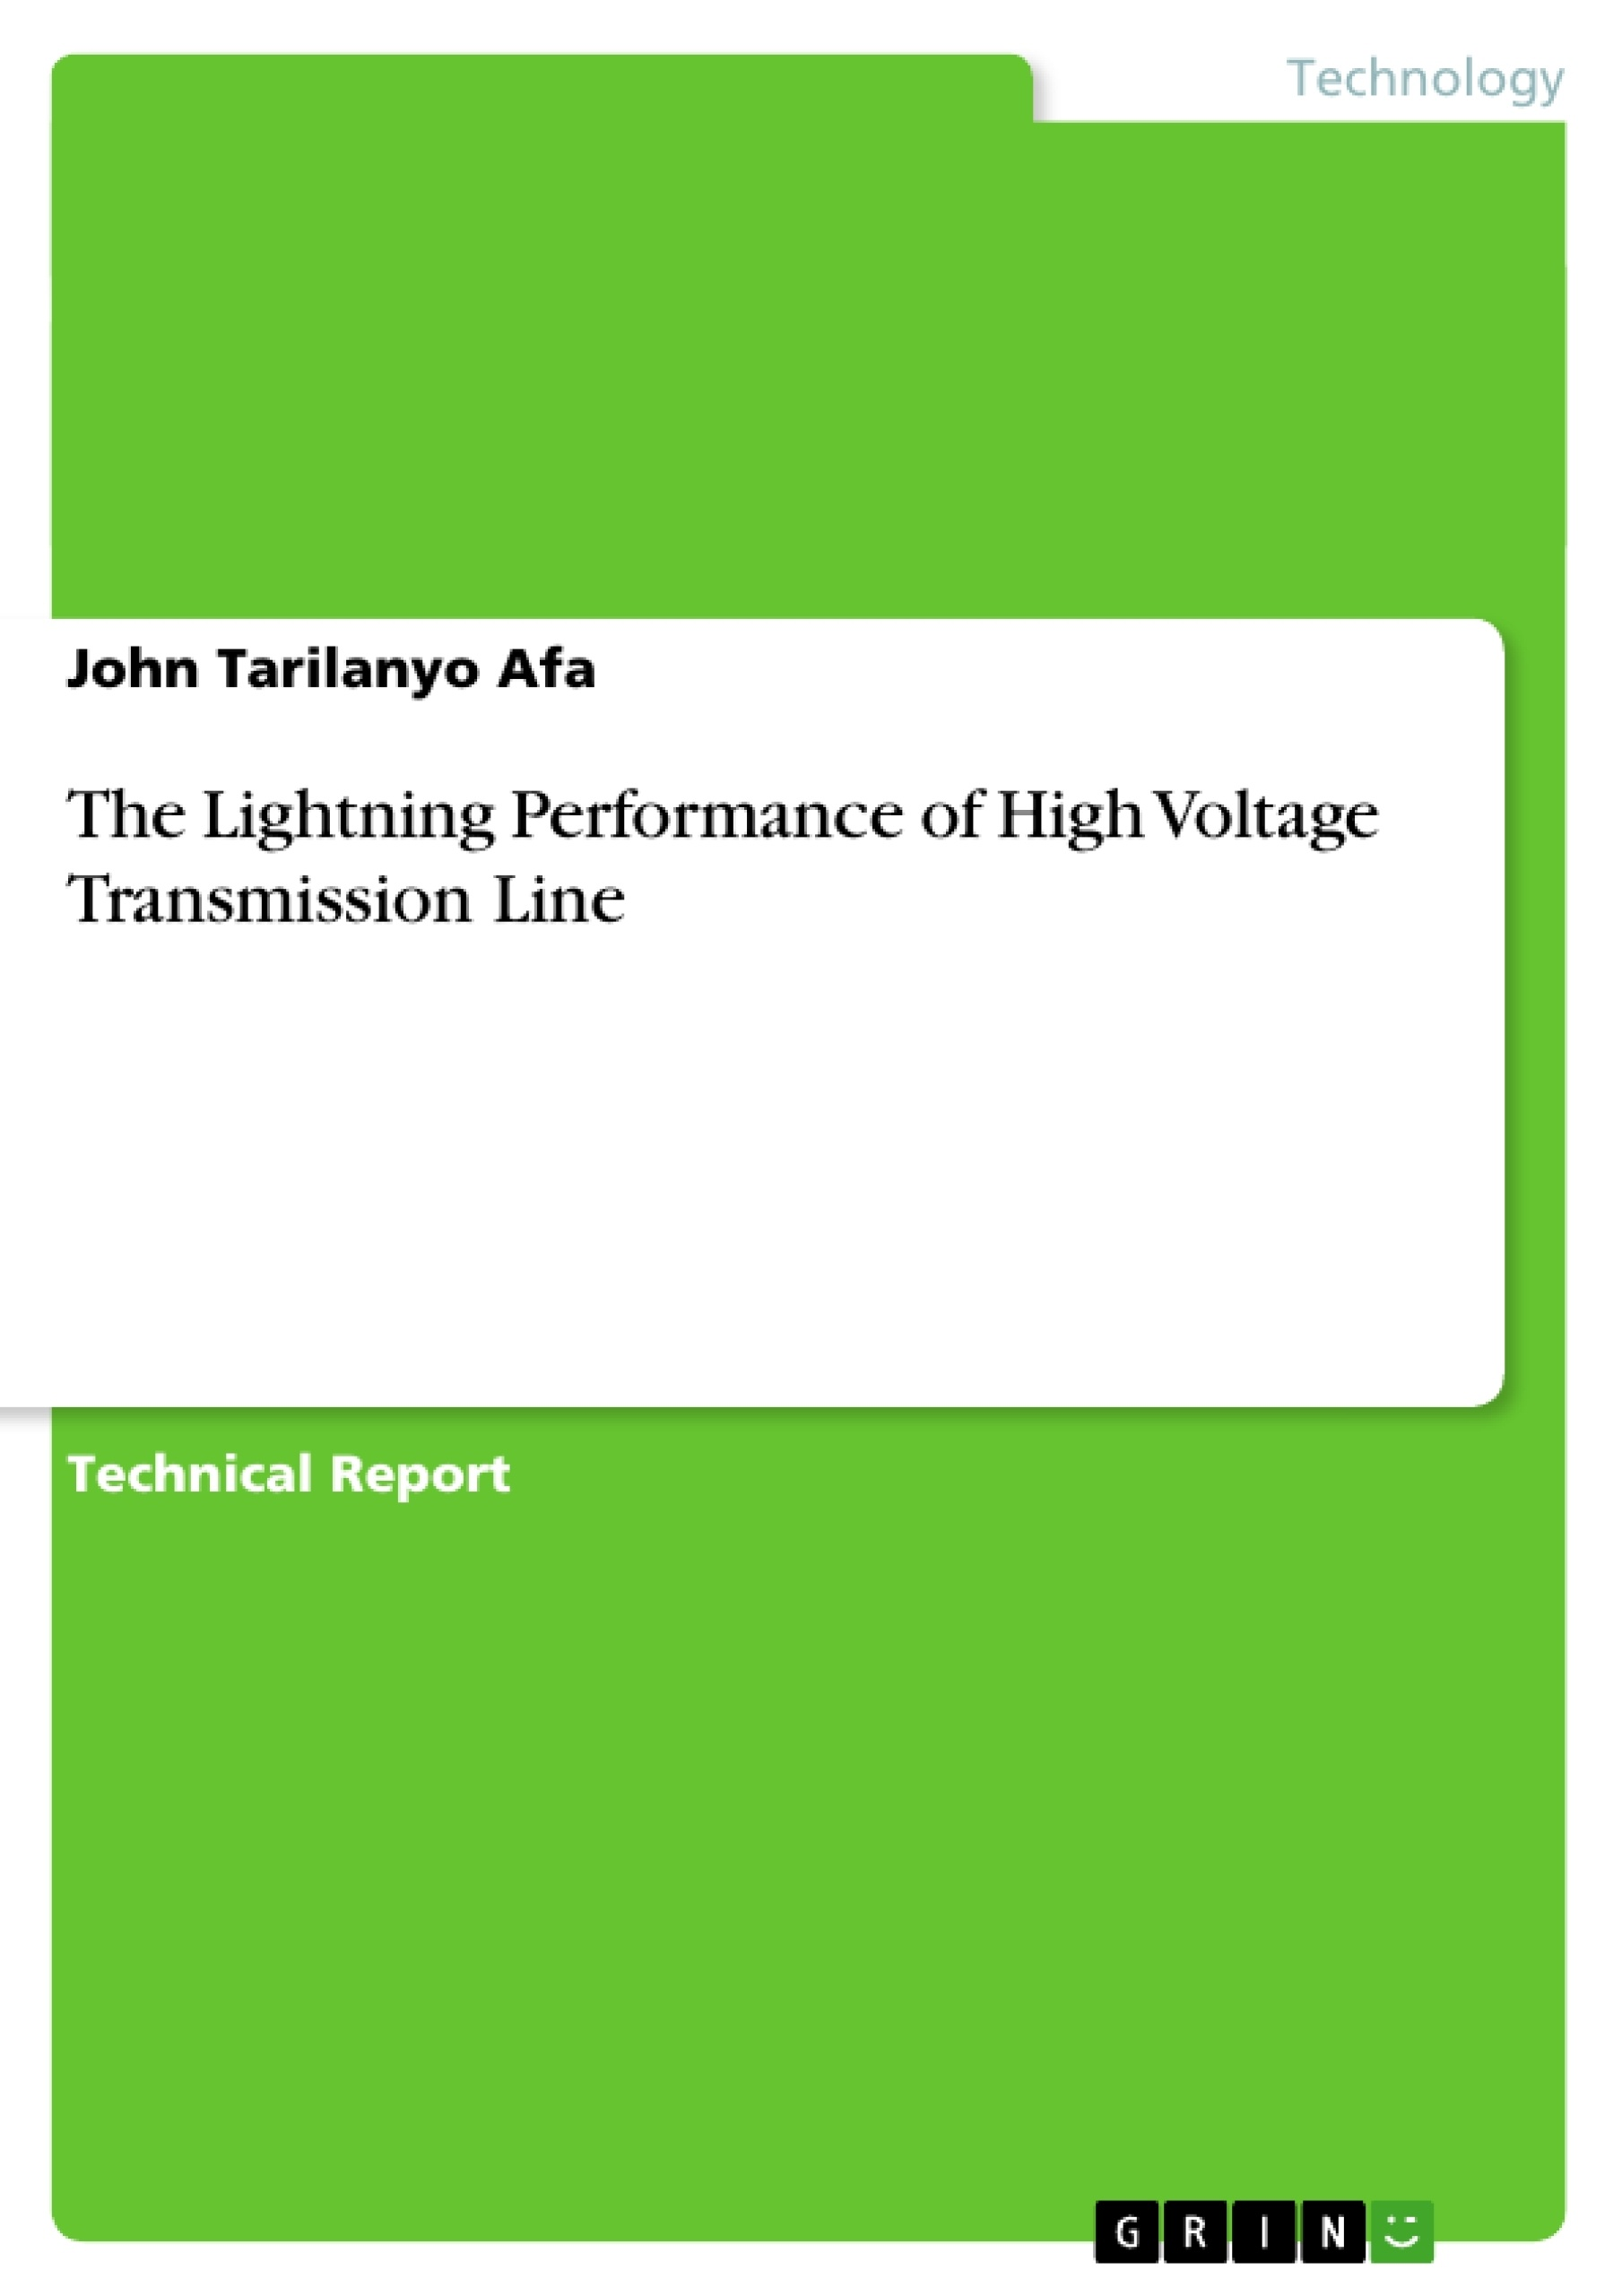 Title: The Lightning Performance of High Voltage Transmission Line